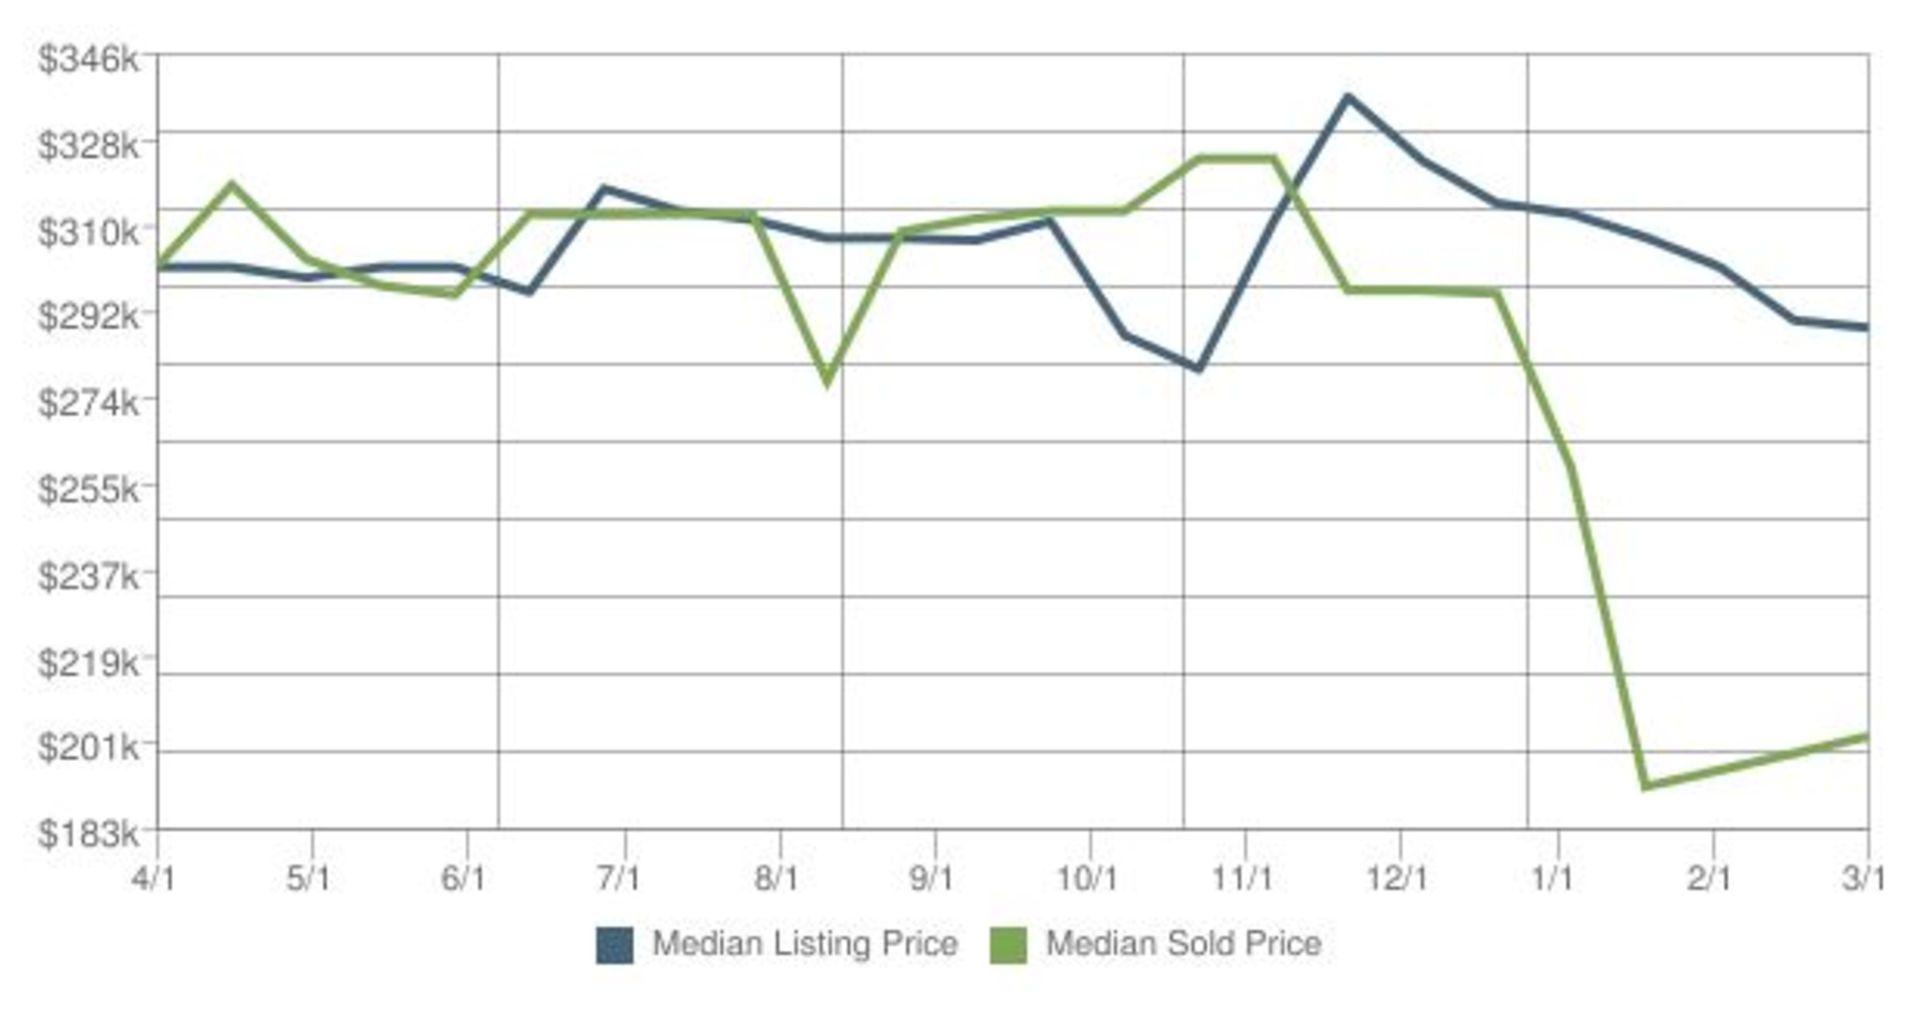 Home Prices in Kodiak Alaska for March 2016